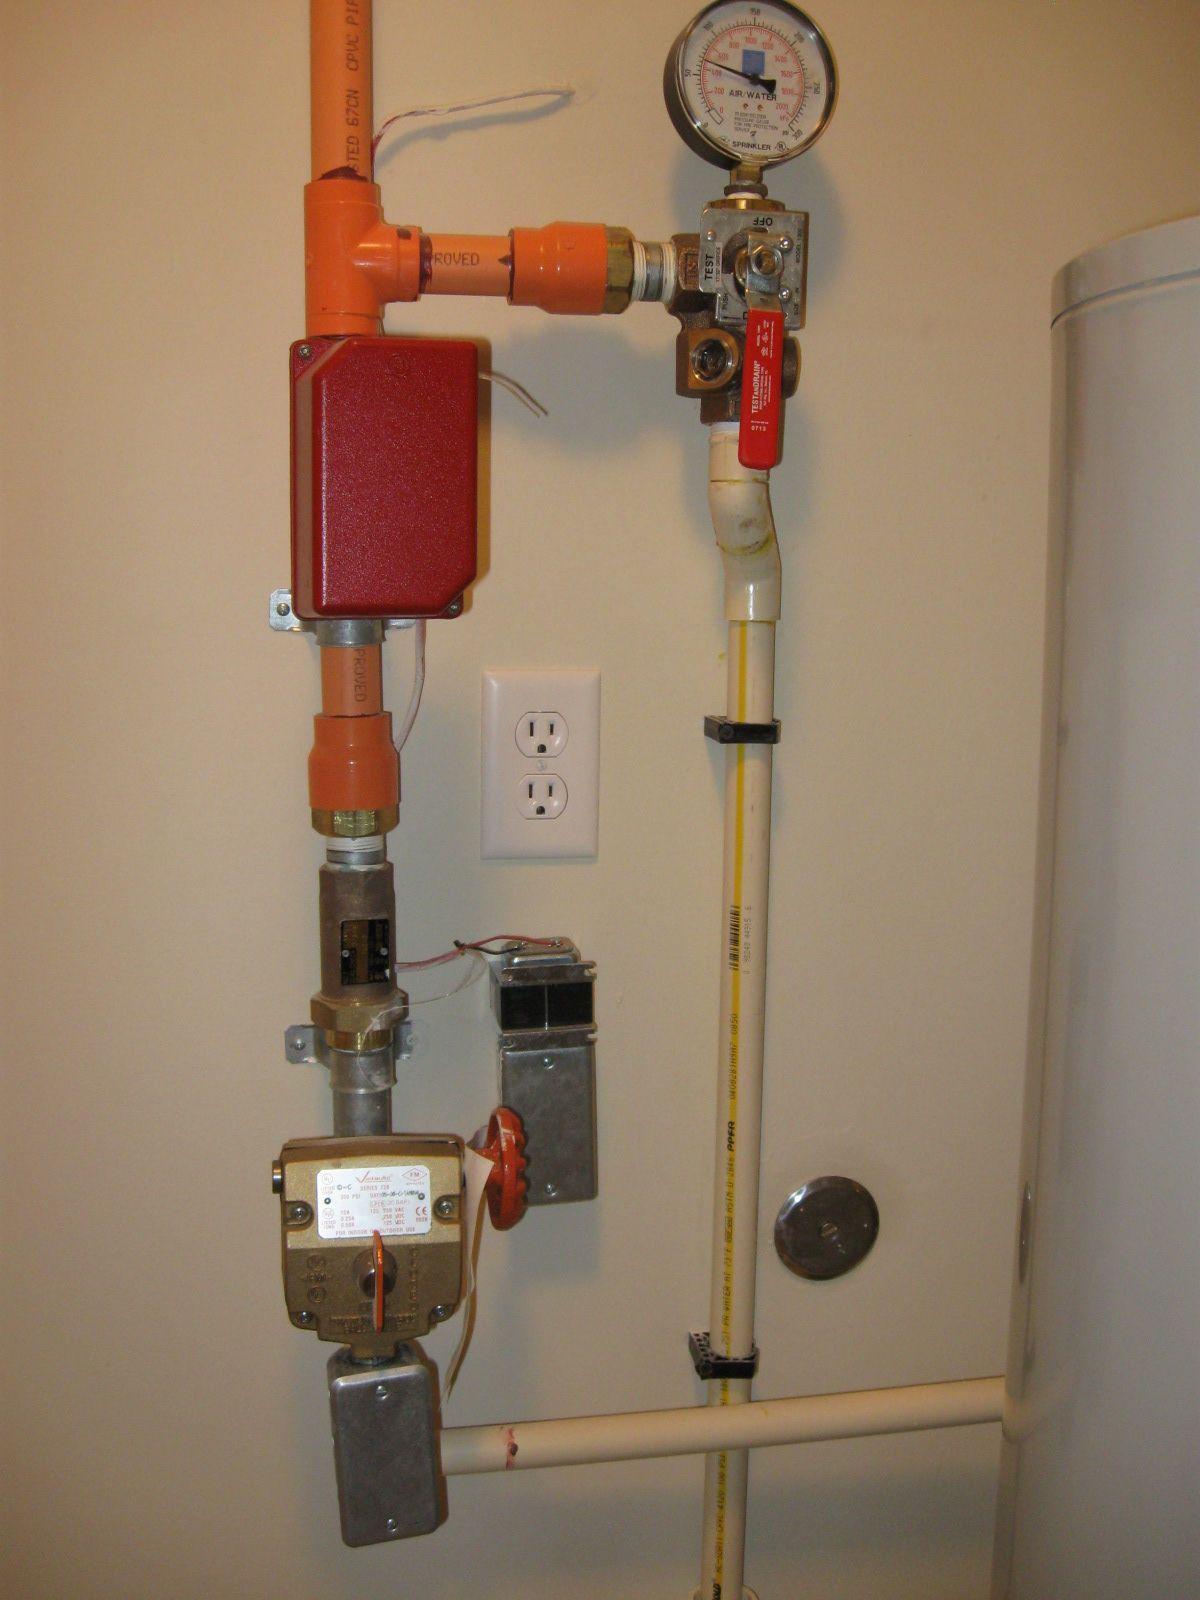 Home Fire Sprinkler System Design S Of Ideas In 2018